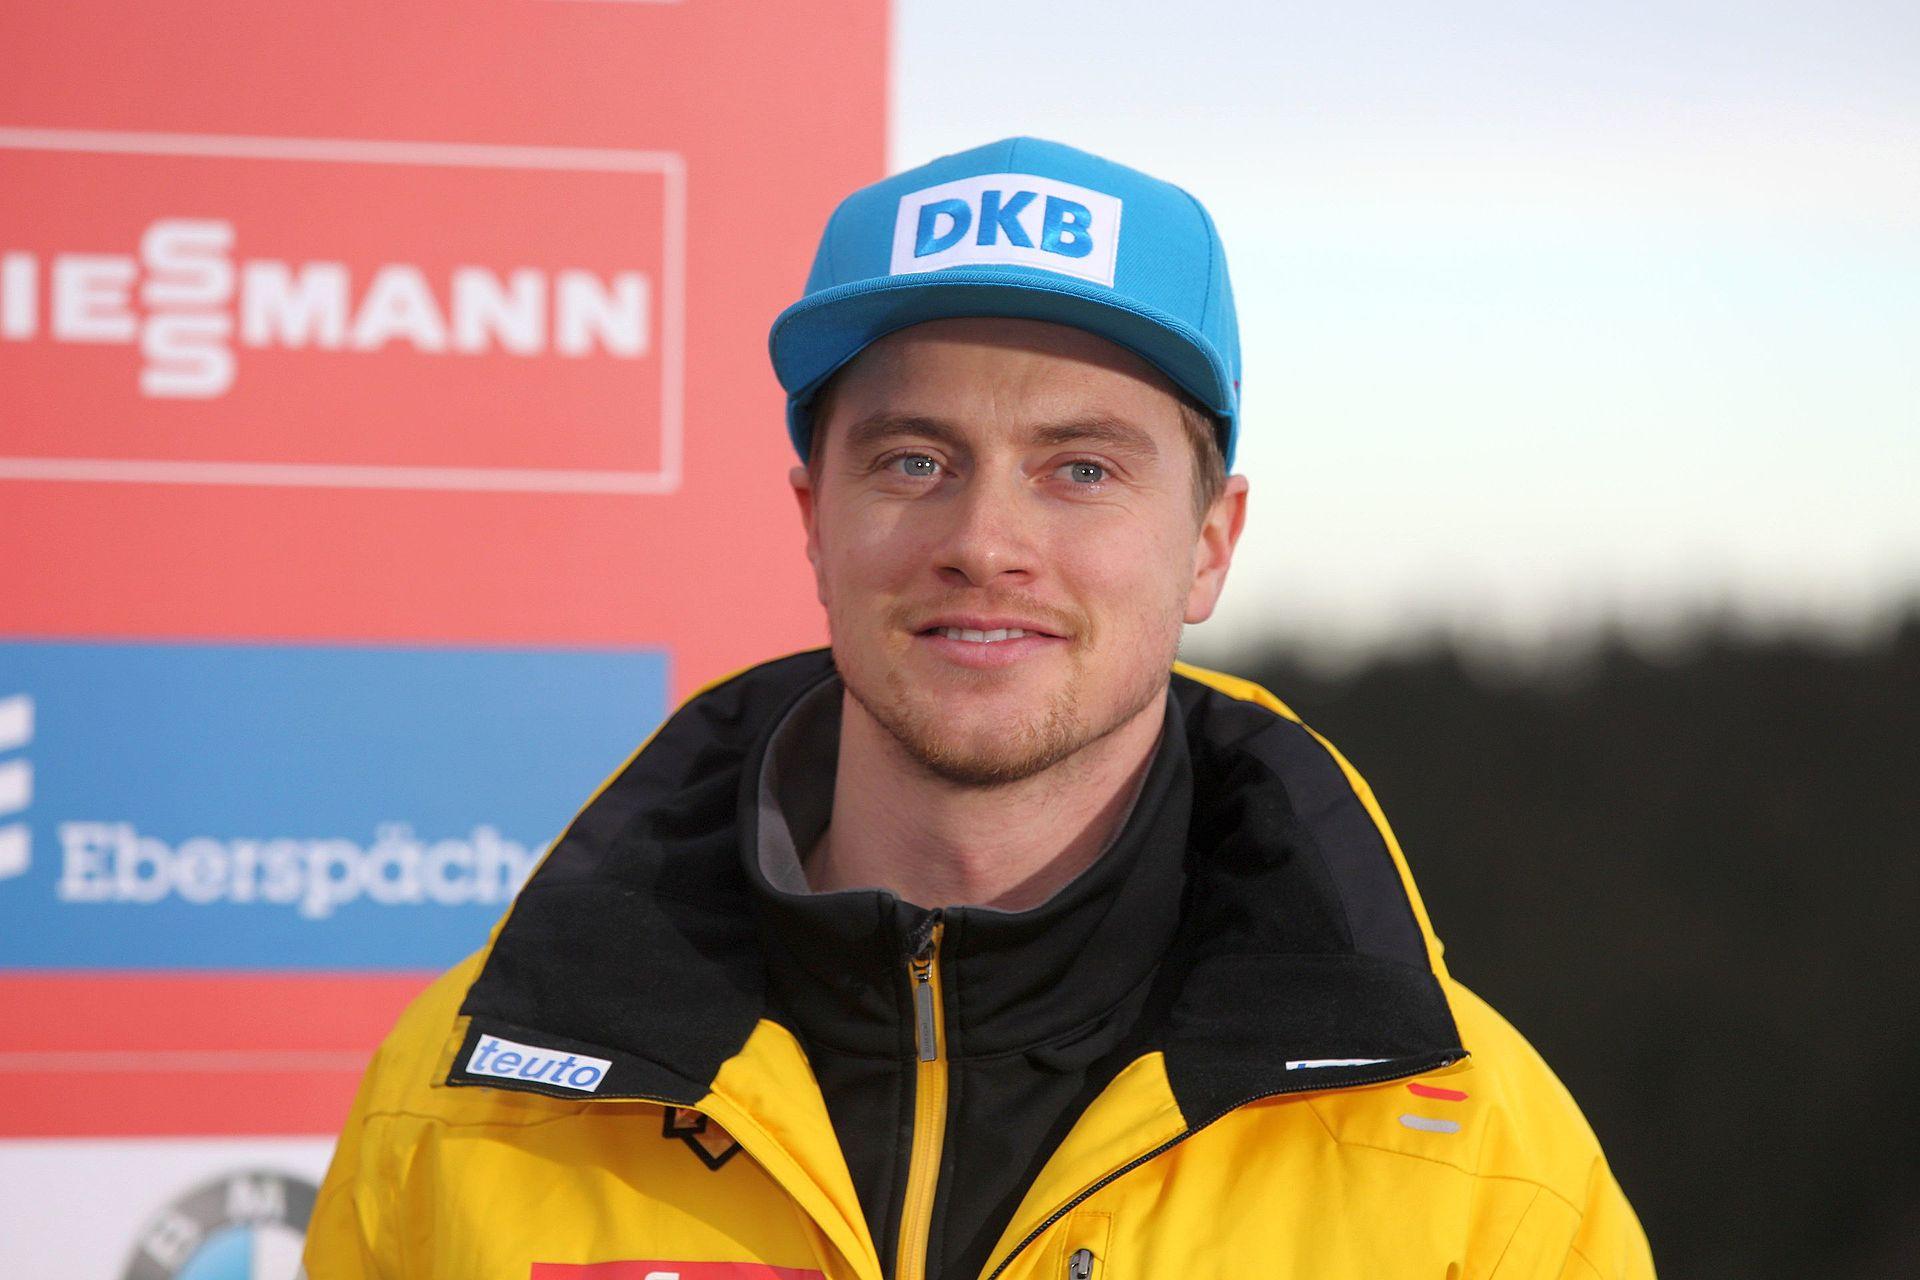 Johannes Ludwig Rodler